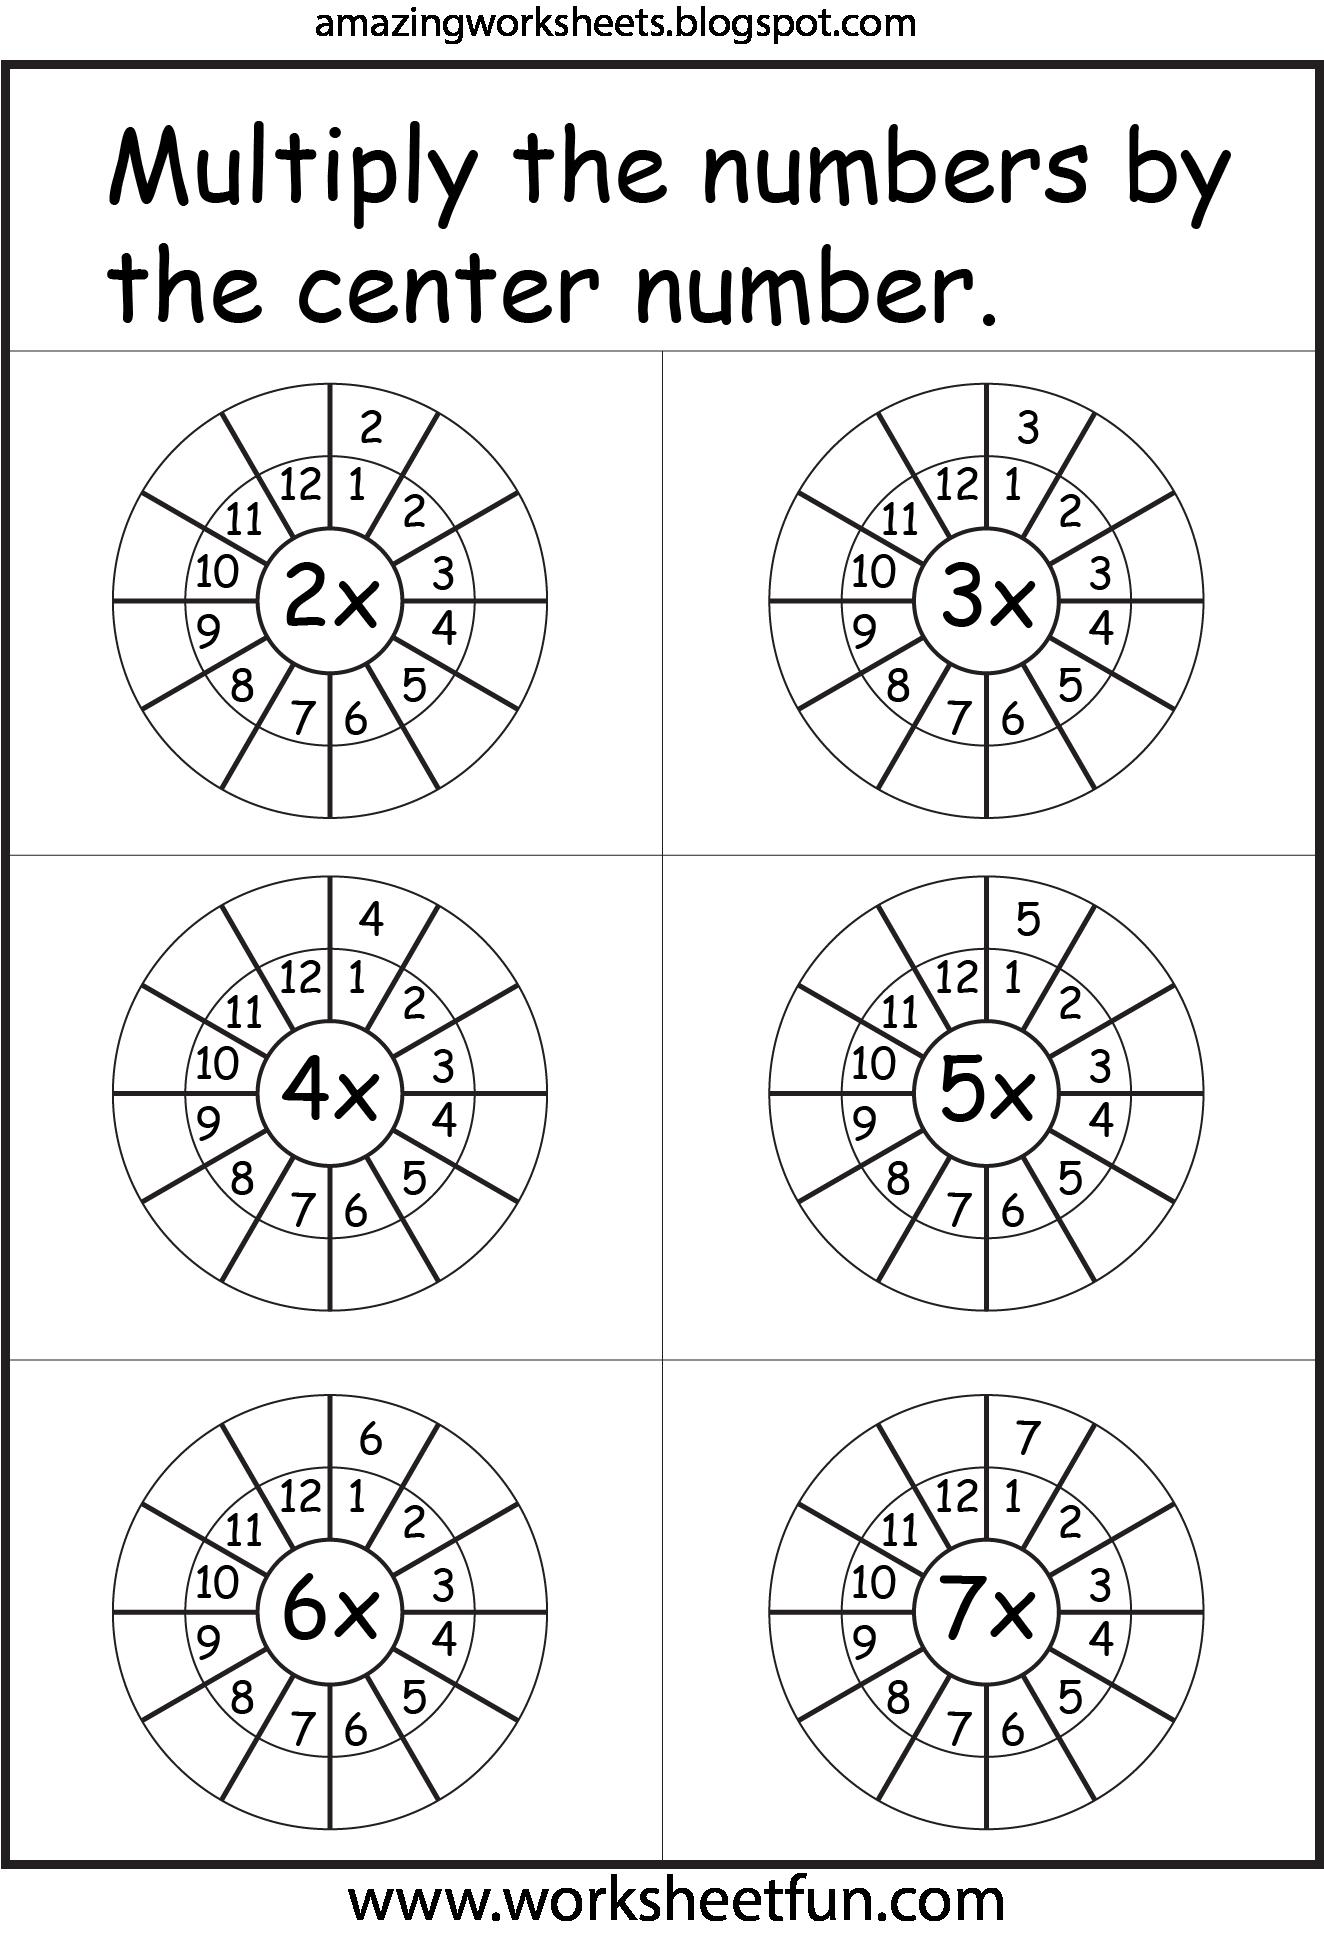 Multiplication Worksheets Math Educacion Escuela